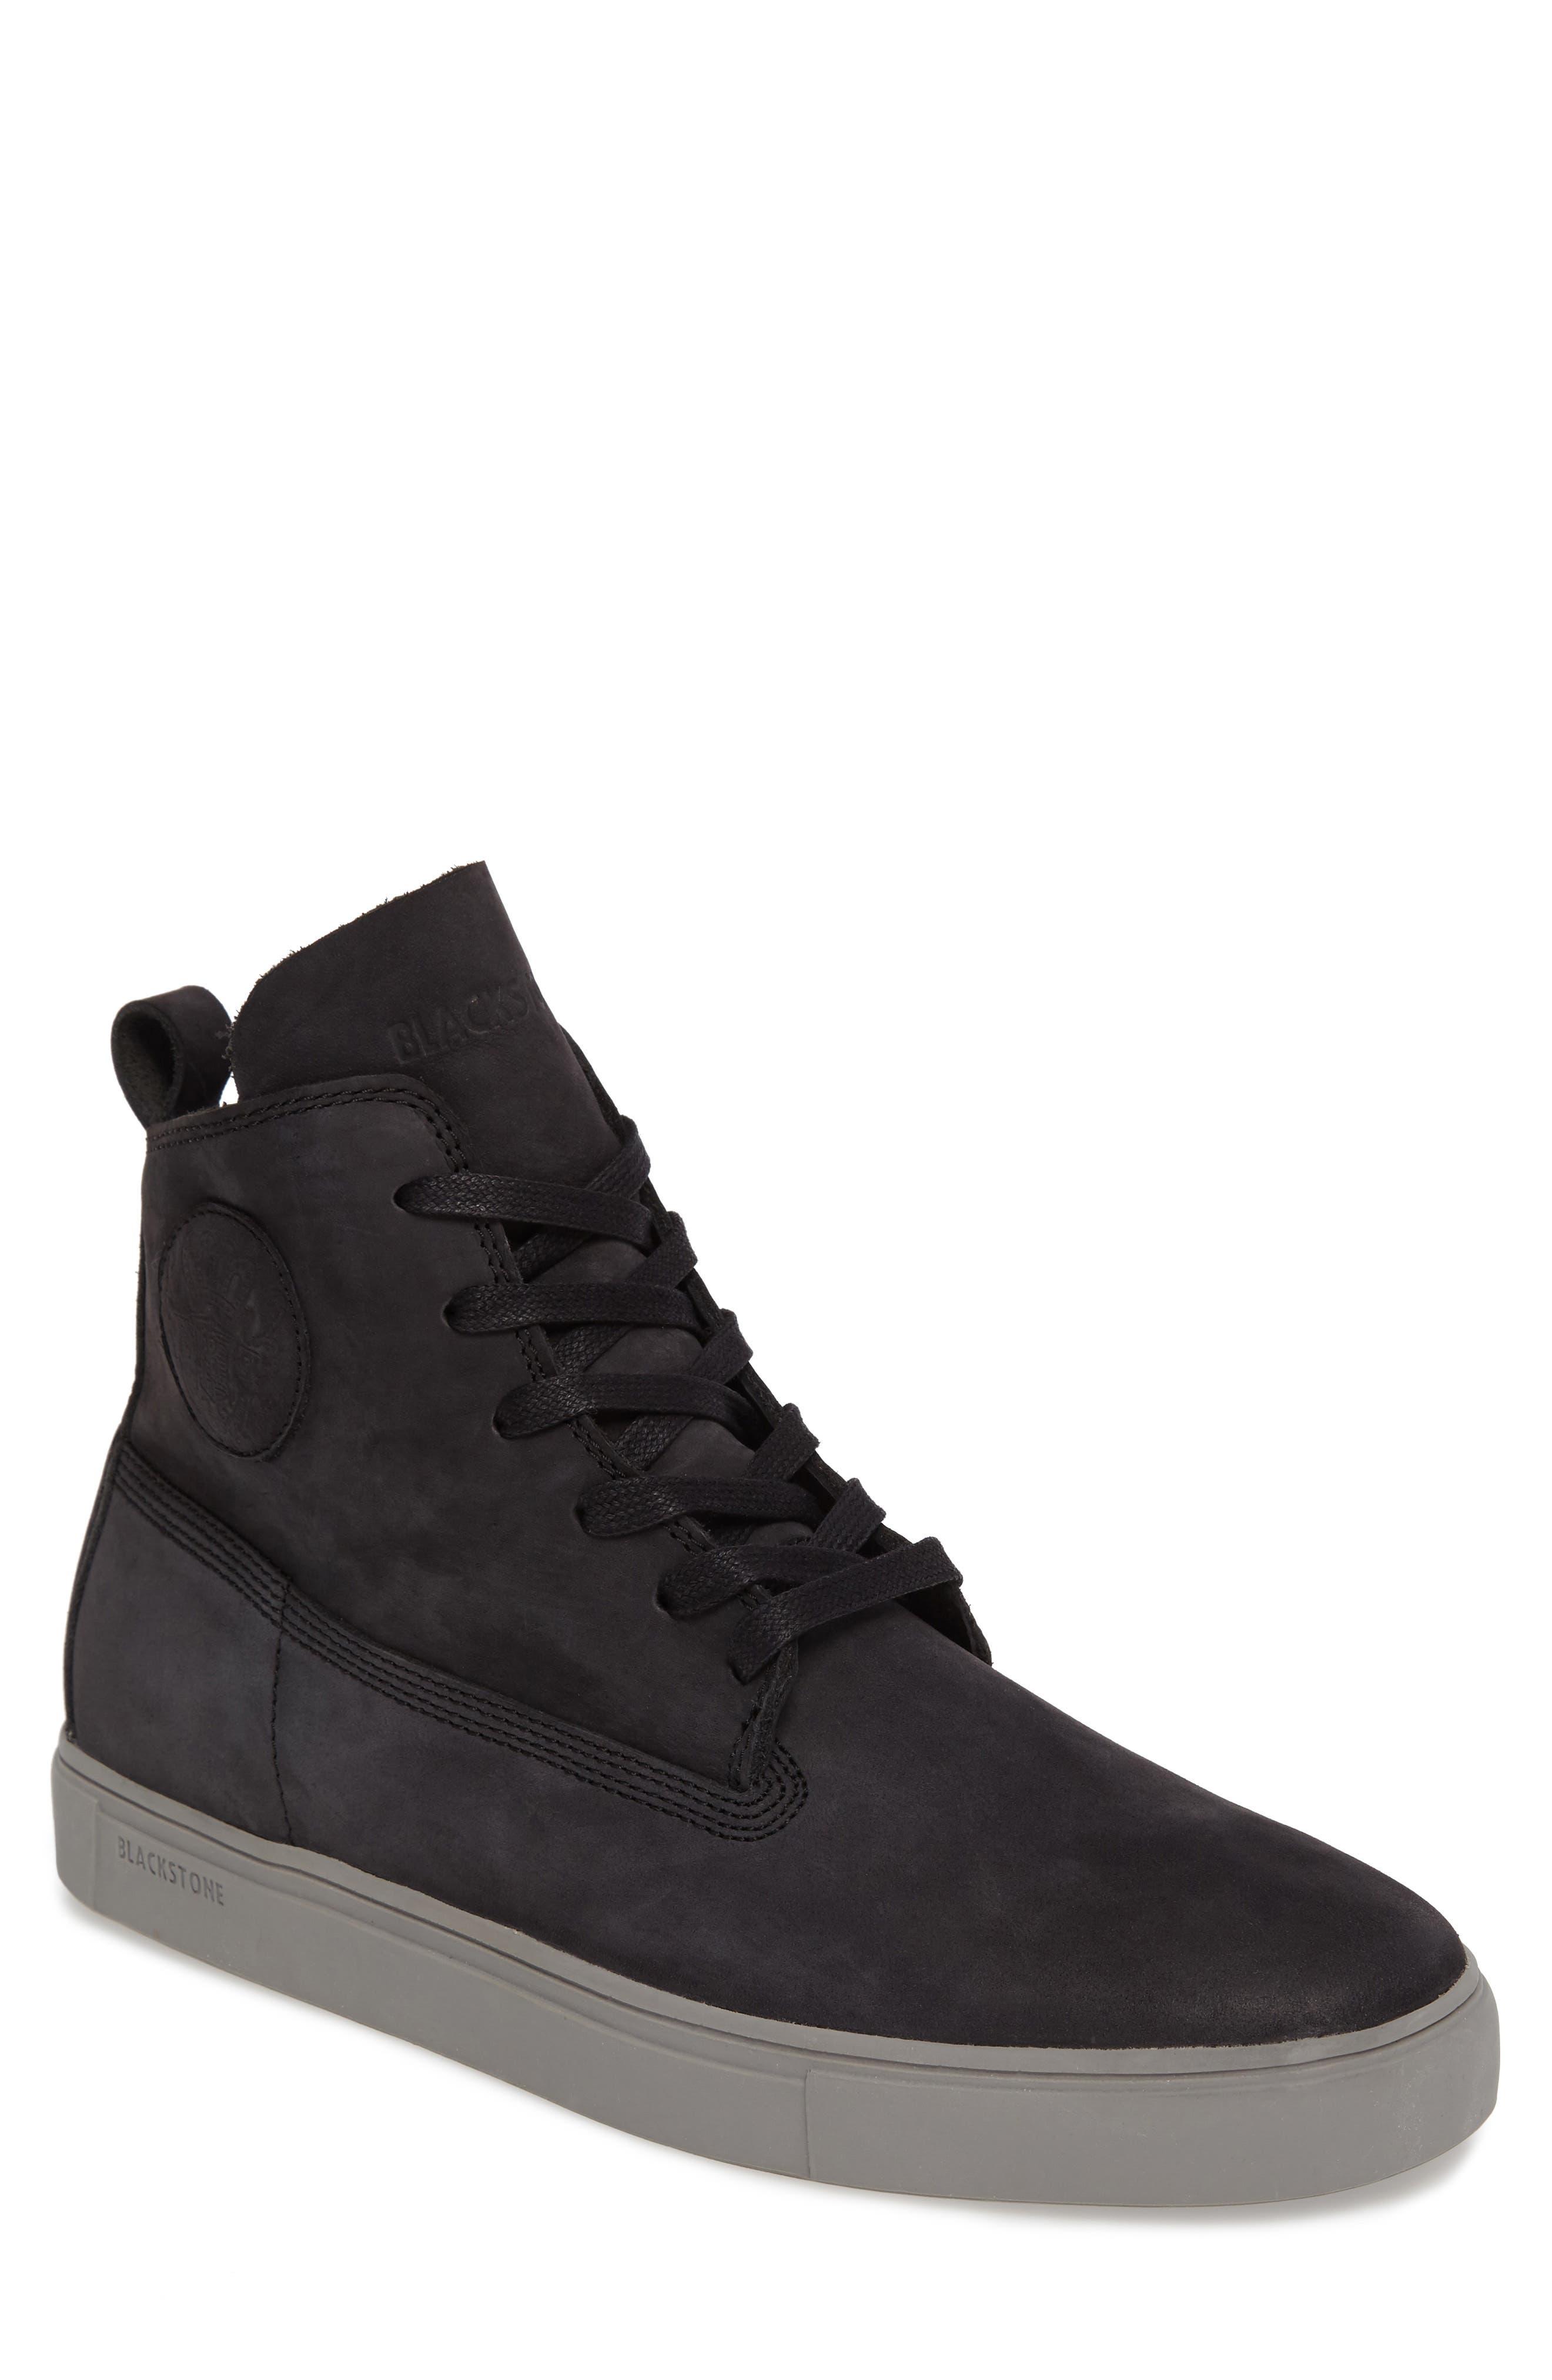 Blackstone 'MM33' High Top Sneaker (Men)